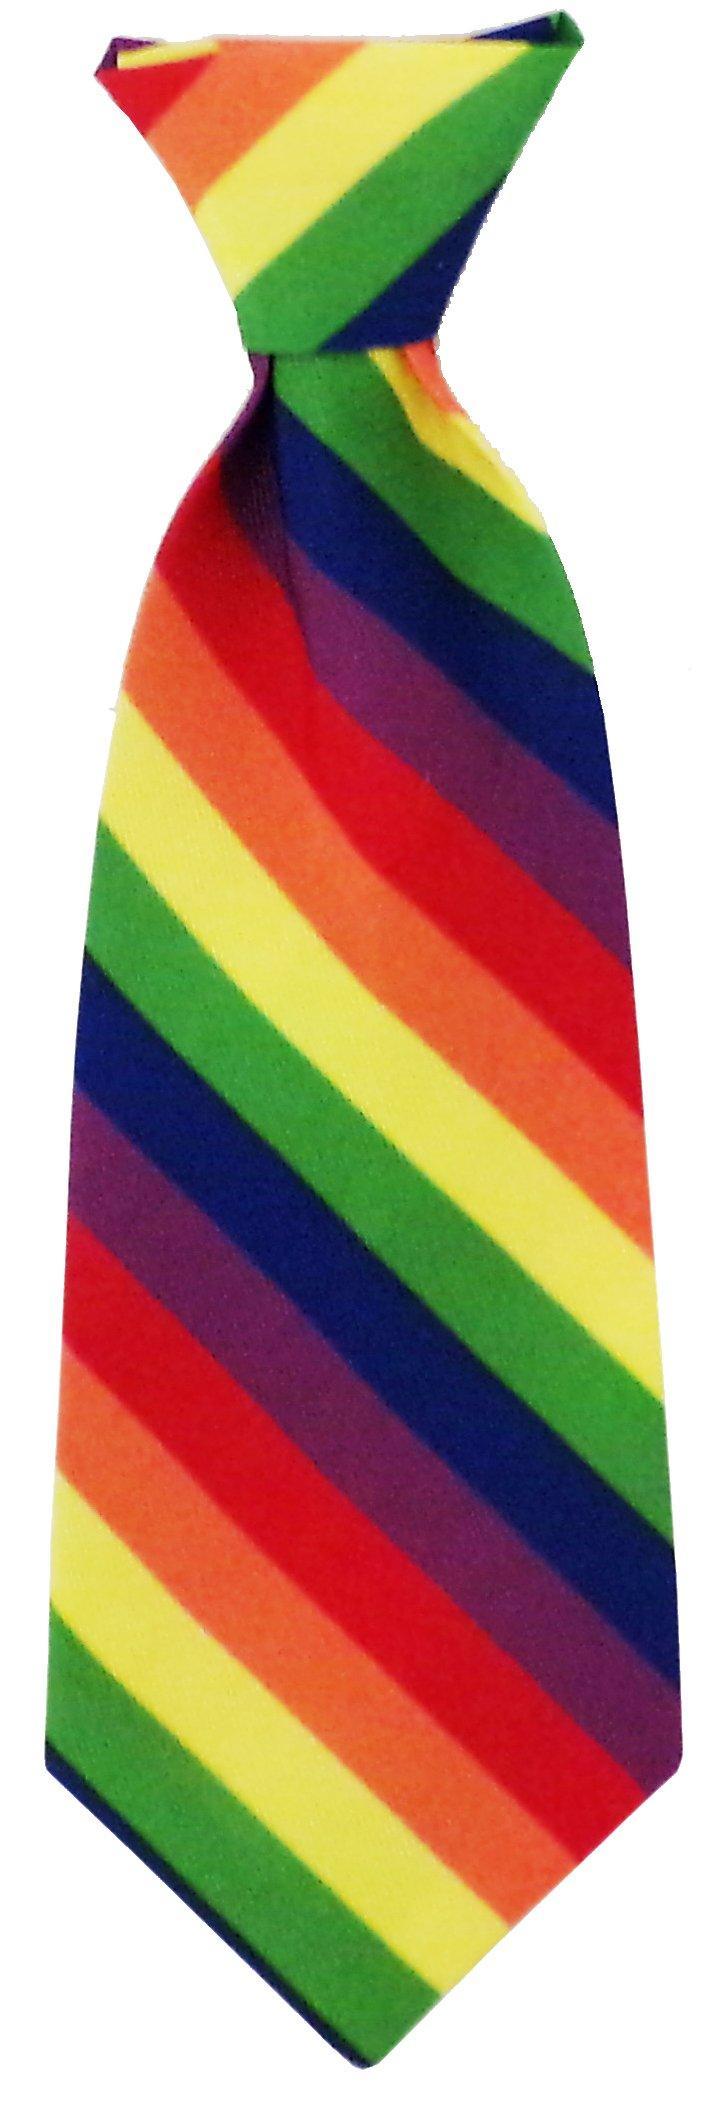 Huxley & Kent Dog Long Tie, Pride, Small